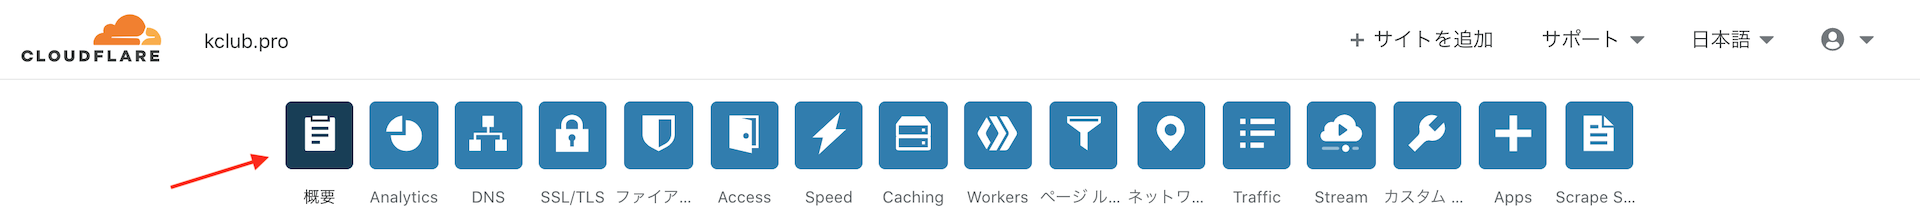 Cloudflareの「概要」ページに移動